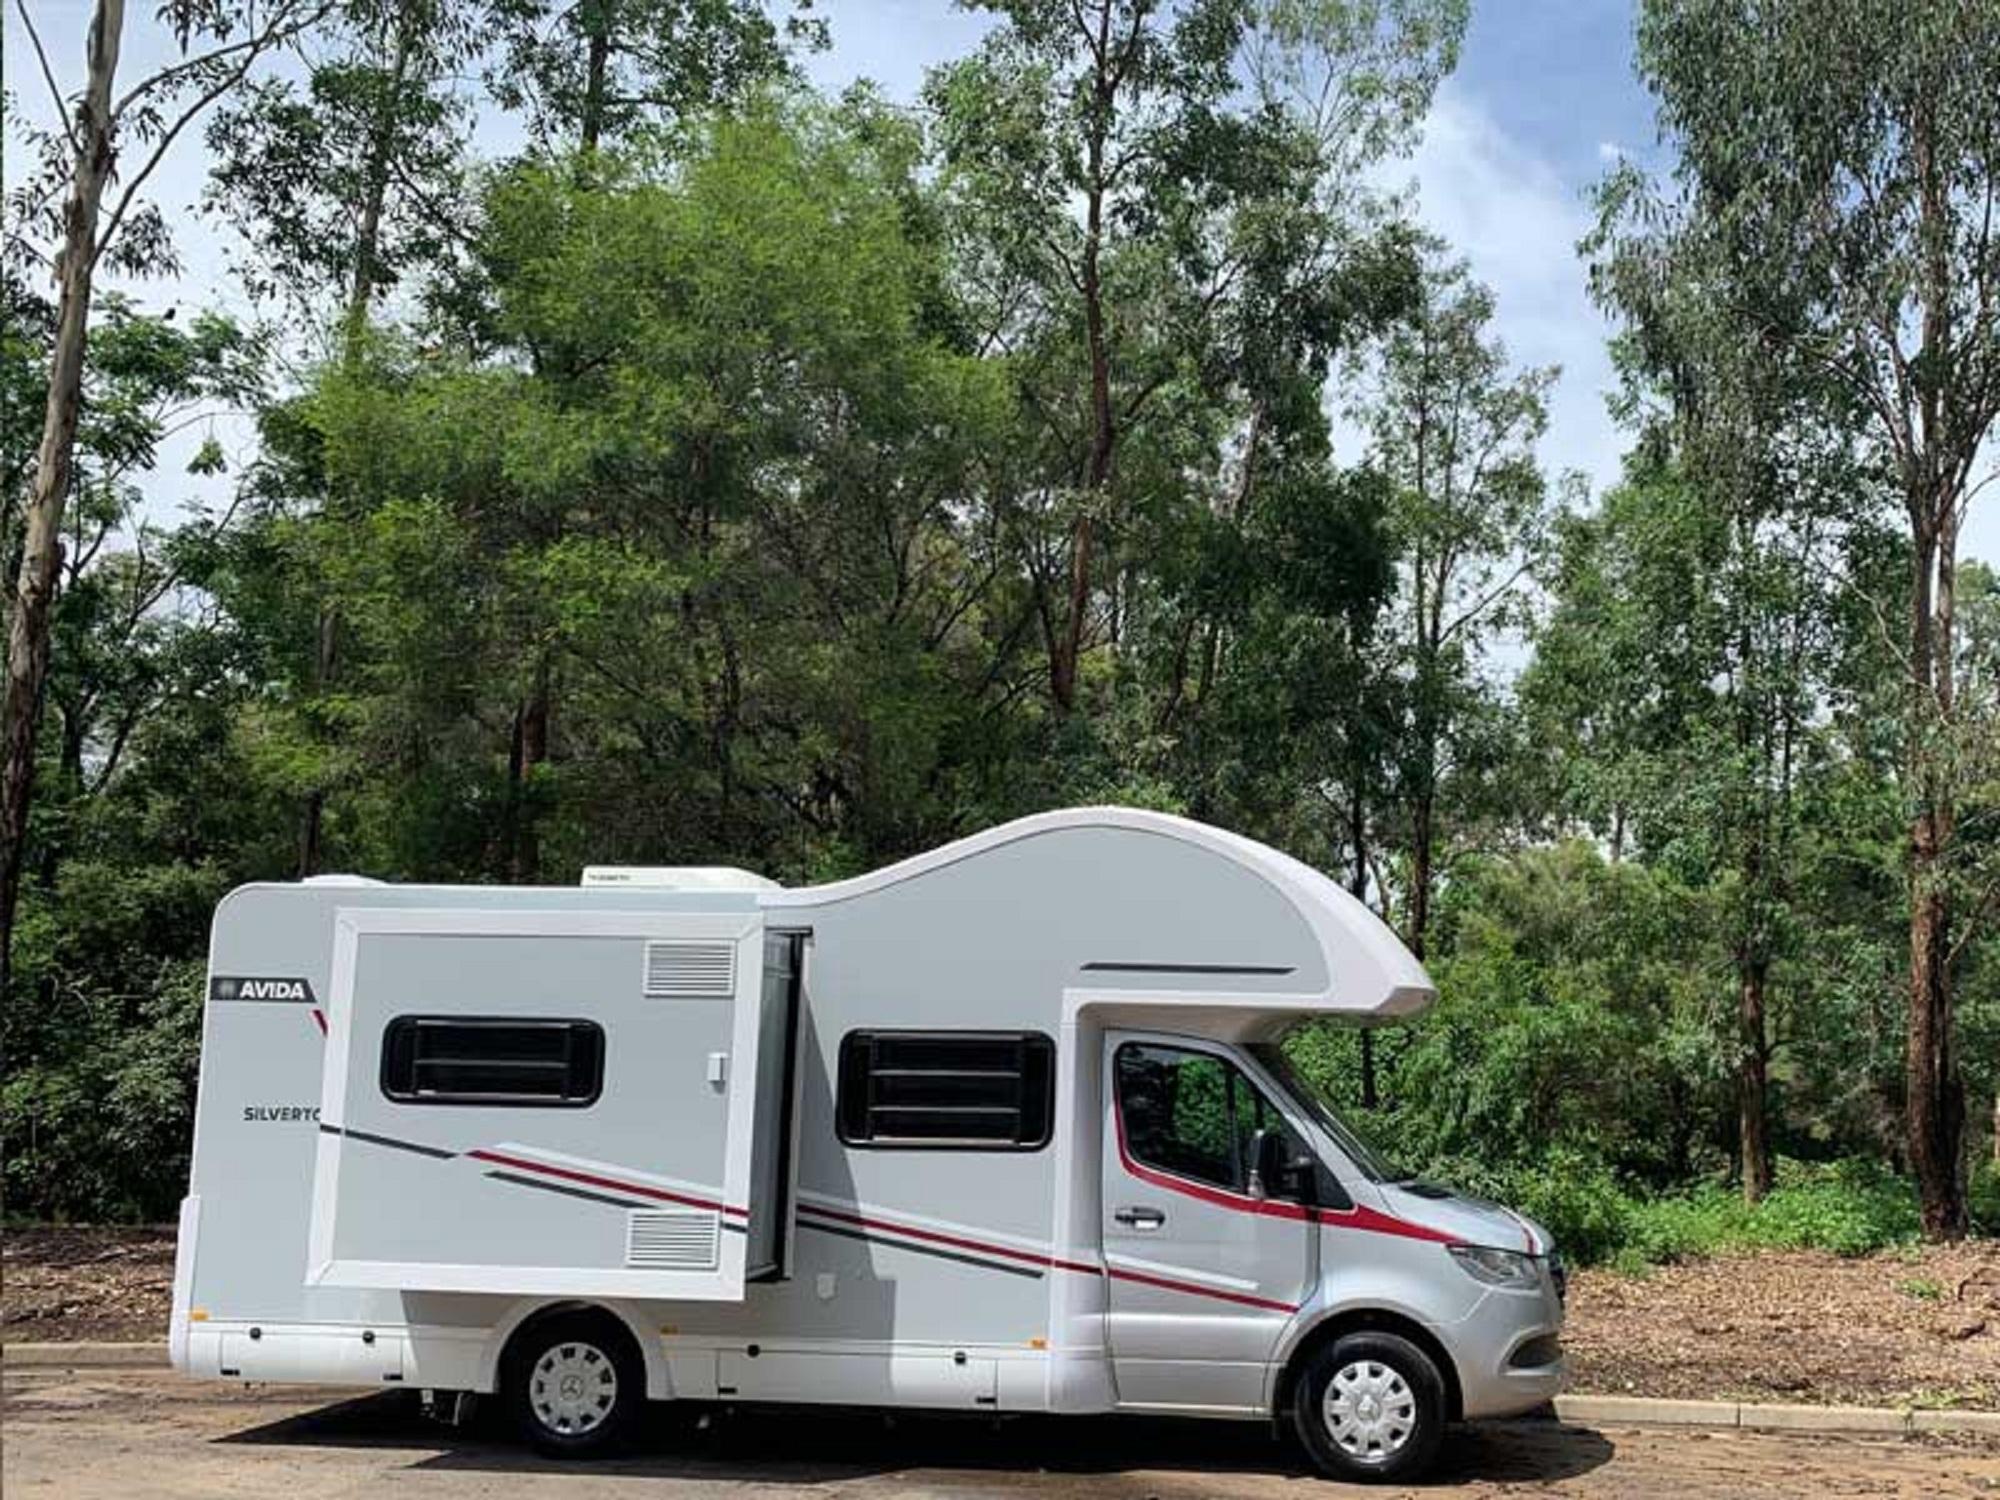 Avida announces new dealer for the Sunshine Coast